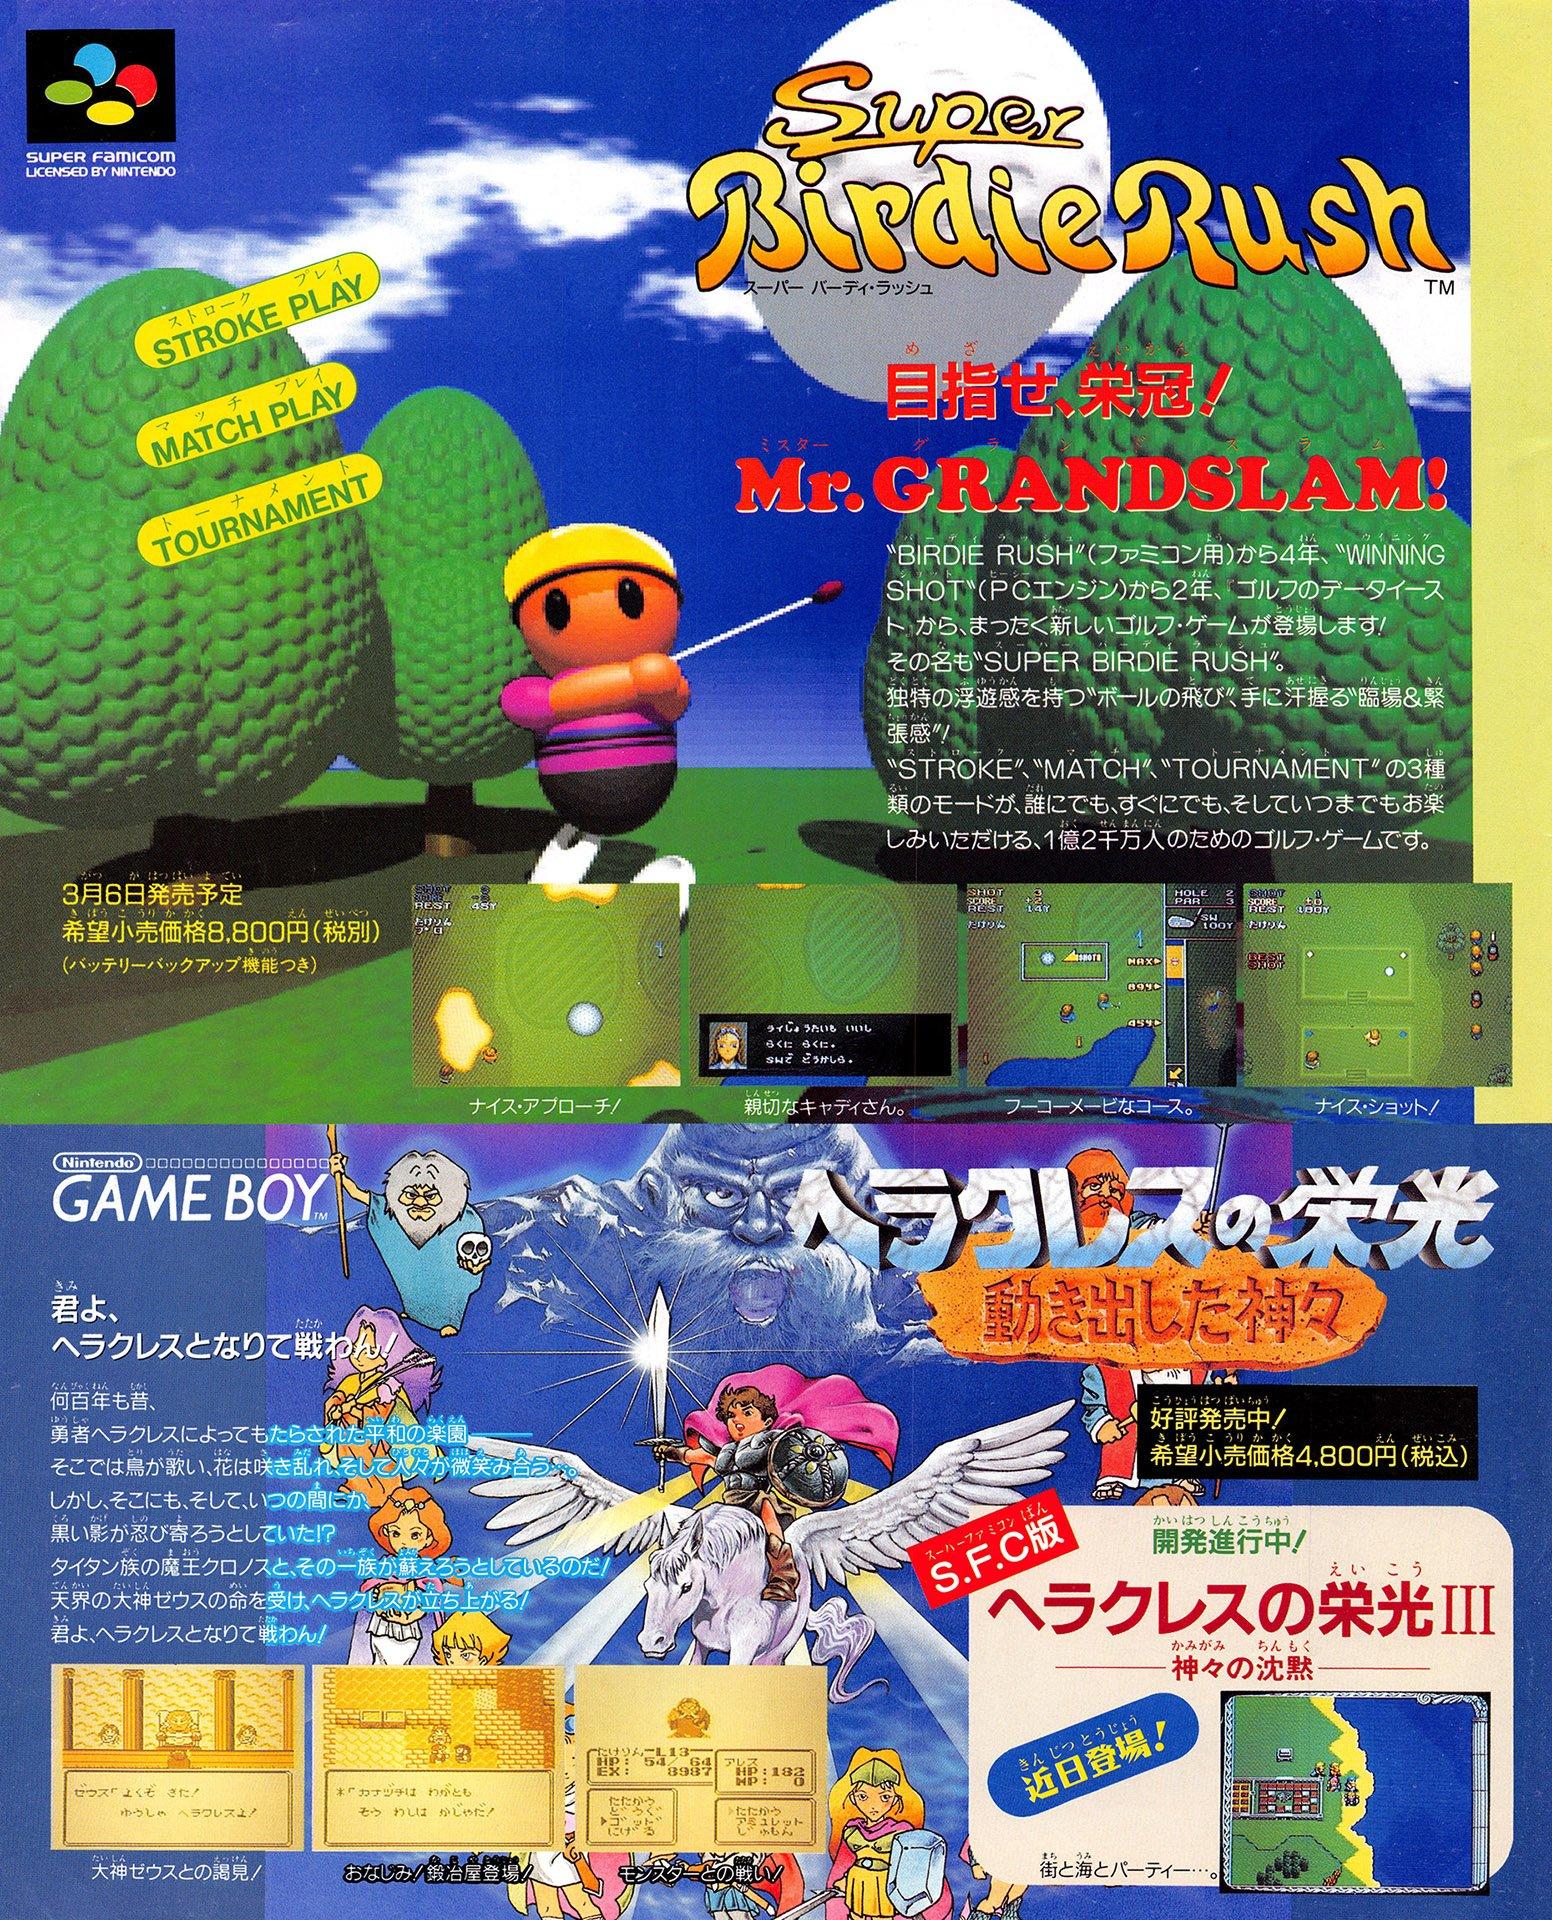 Super Birdie Rush, Heracles no Eikō: Ugokidashita Kamigami (Japan)